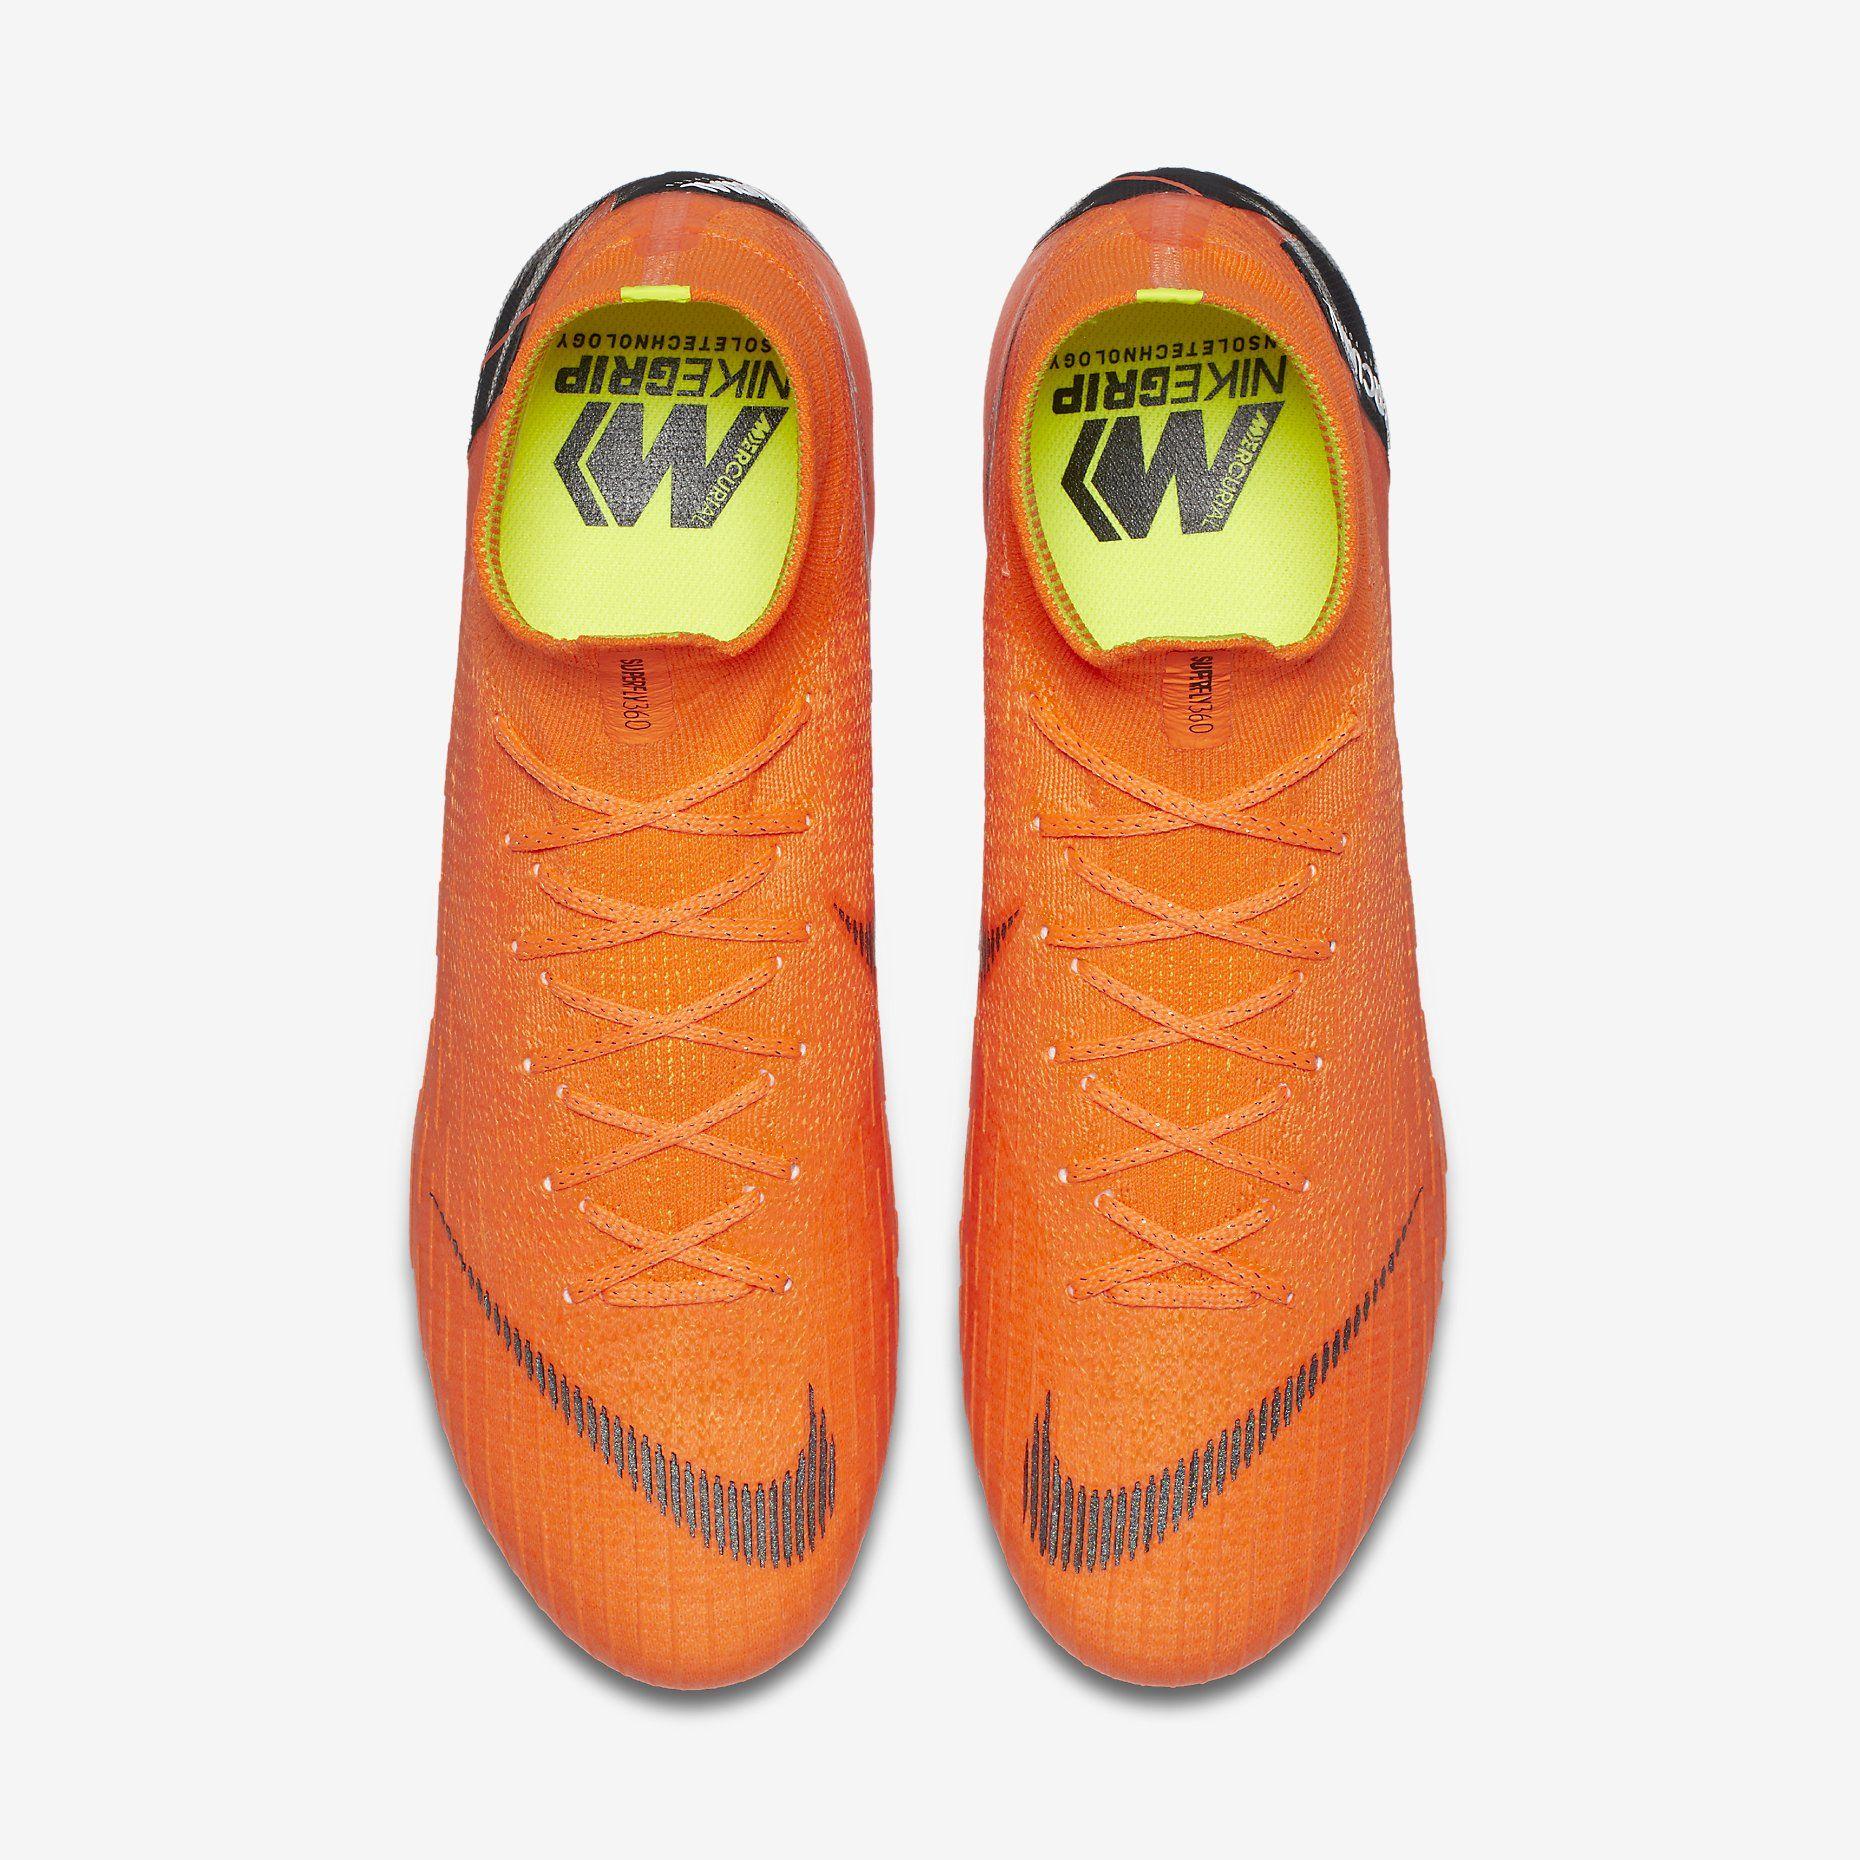 541d27673 Nike Mercurial Superfly 360 Elite FG - Total Orange / Total Orange / Volt /  White | Football boots | Football shirt blog